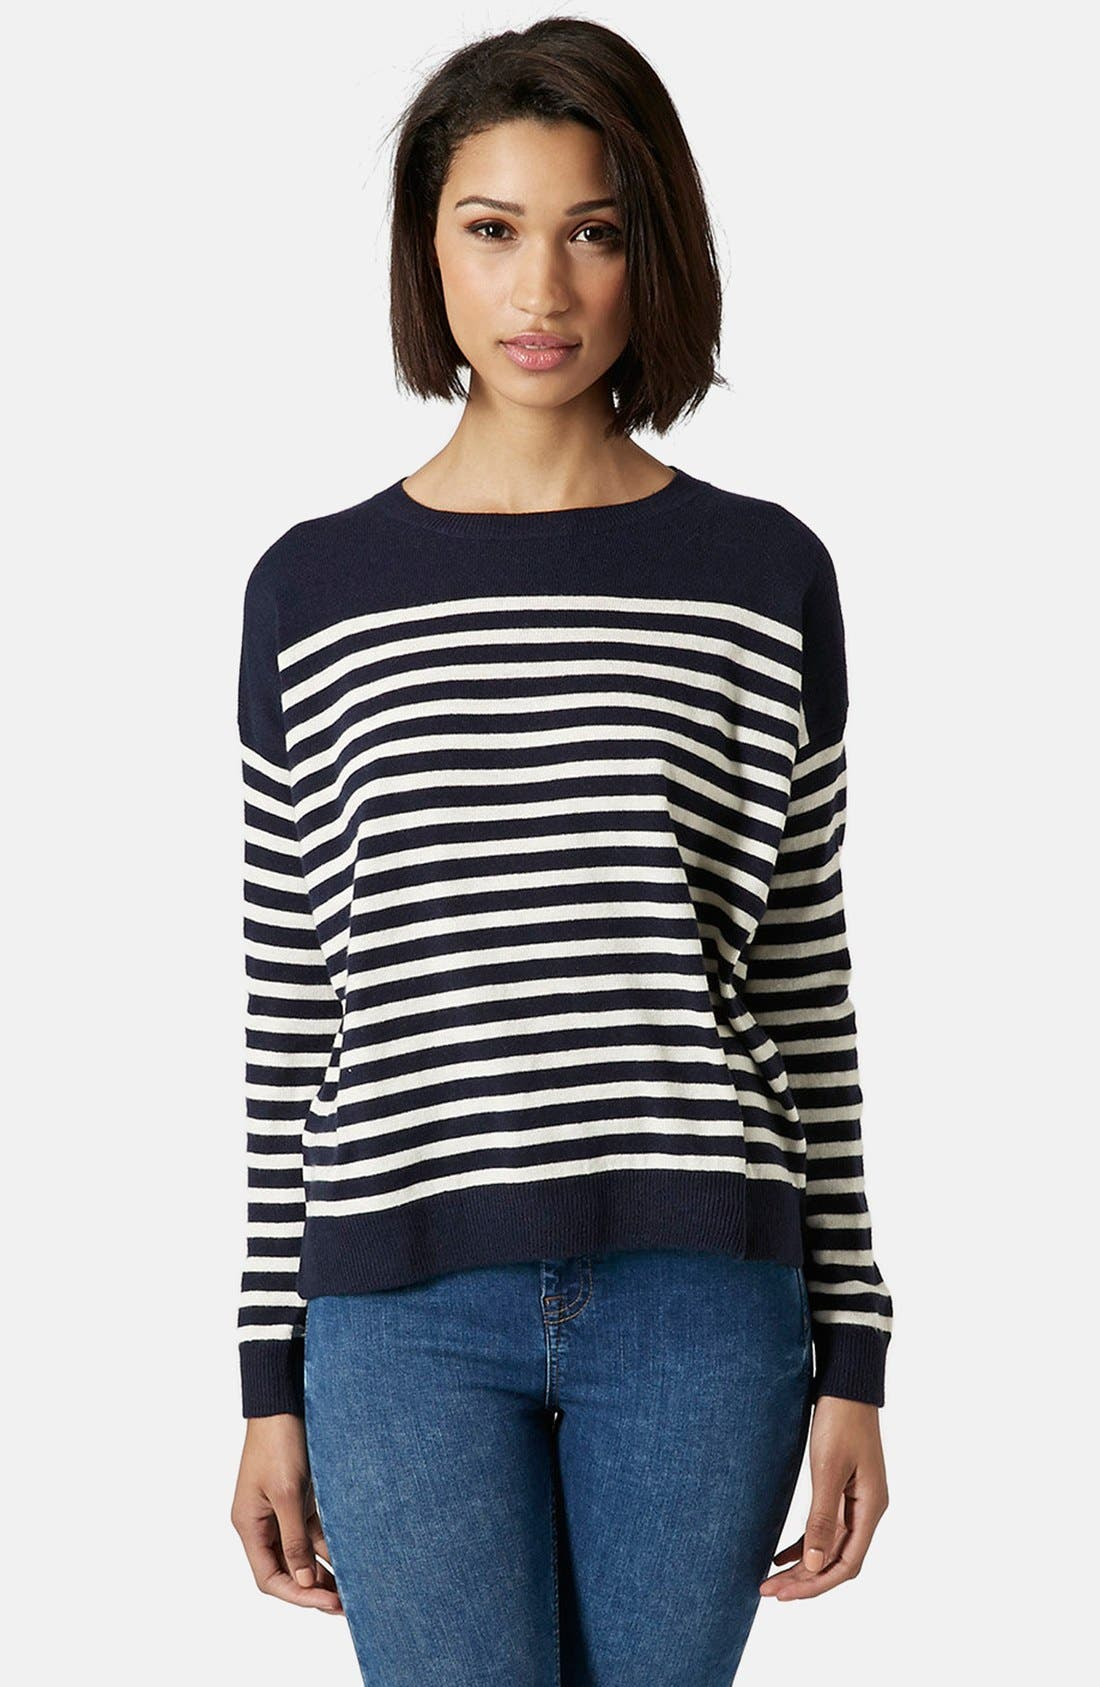 Alternate Image 1 Selected - Topshop Breton Stripe Pullover Sweater